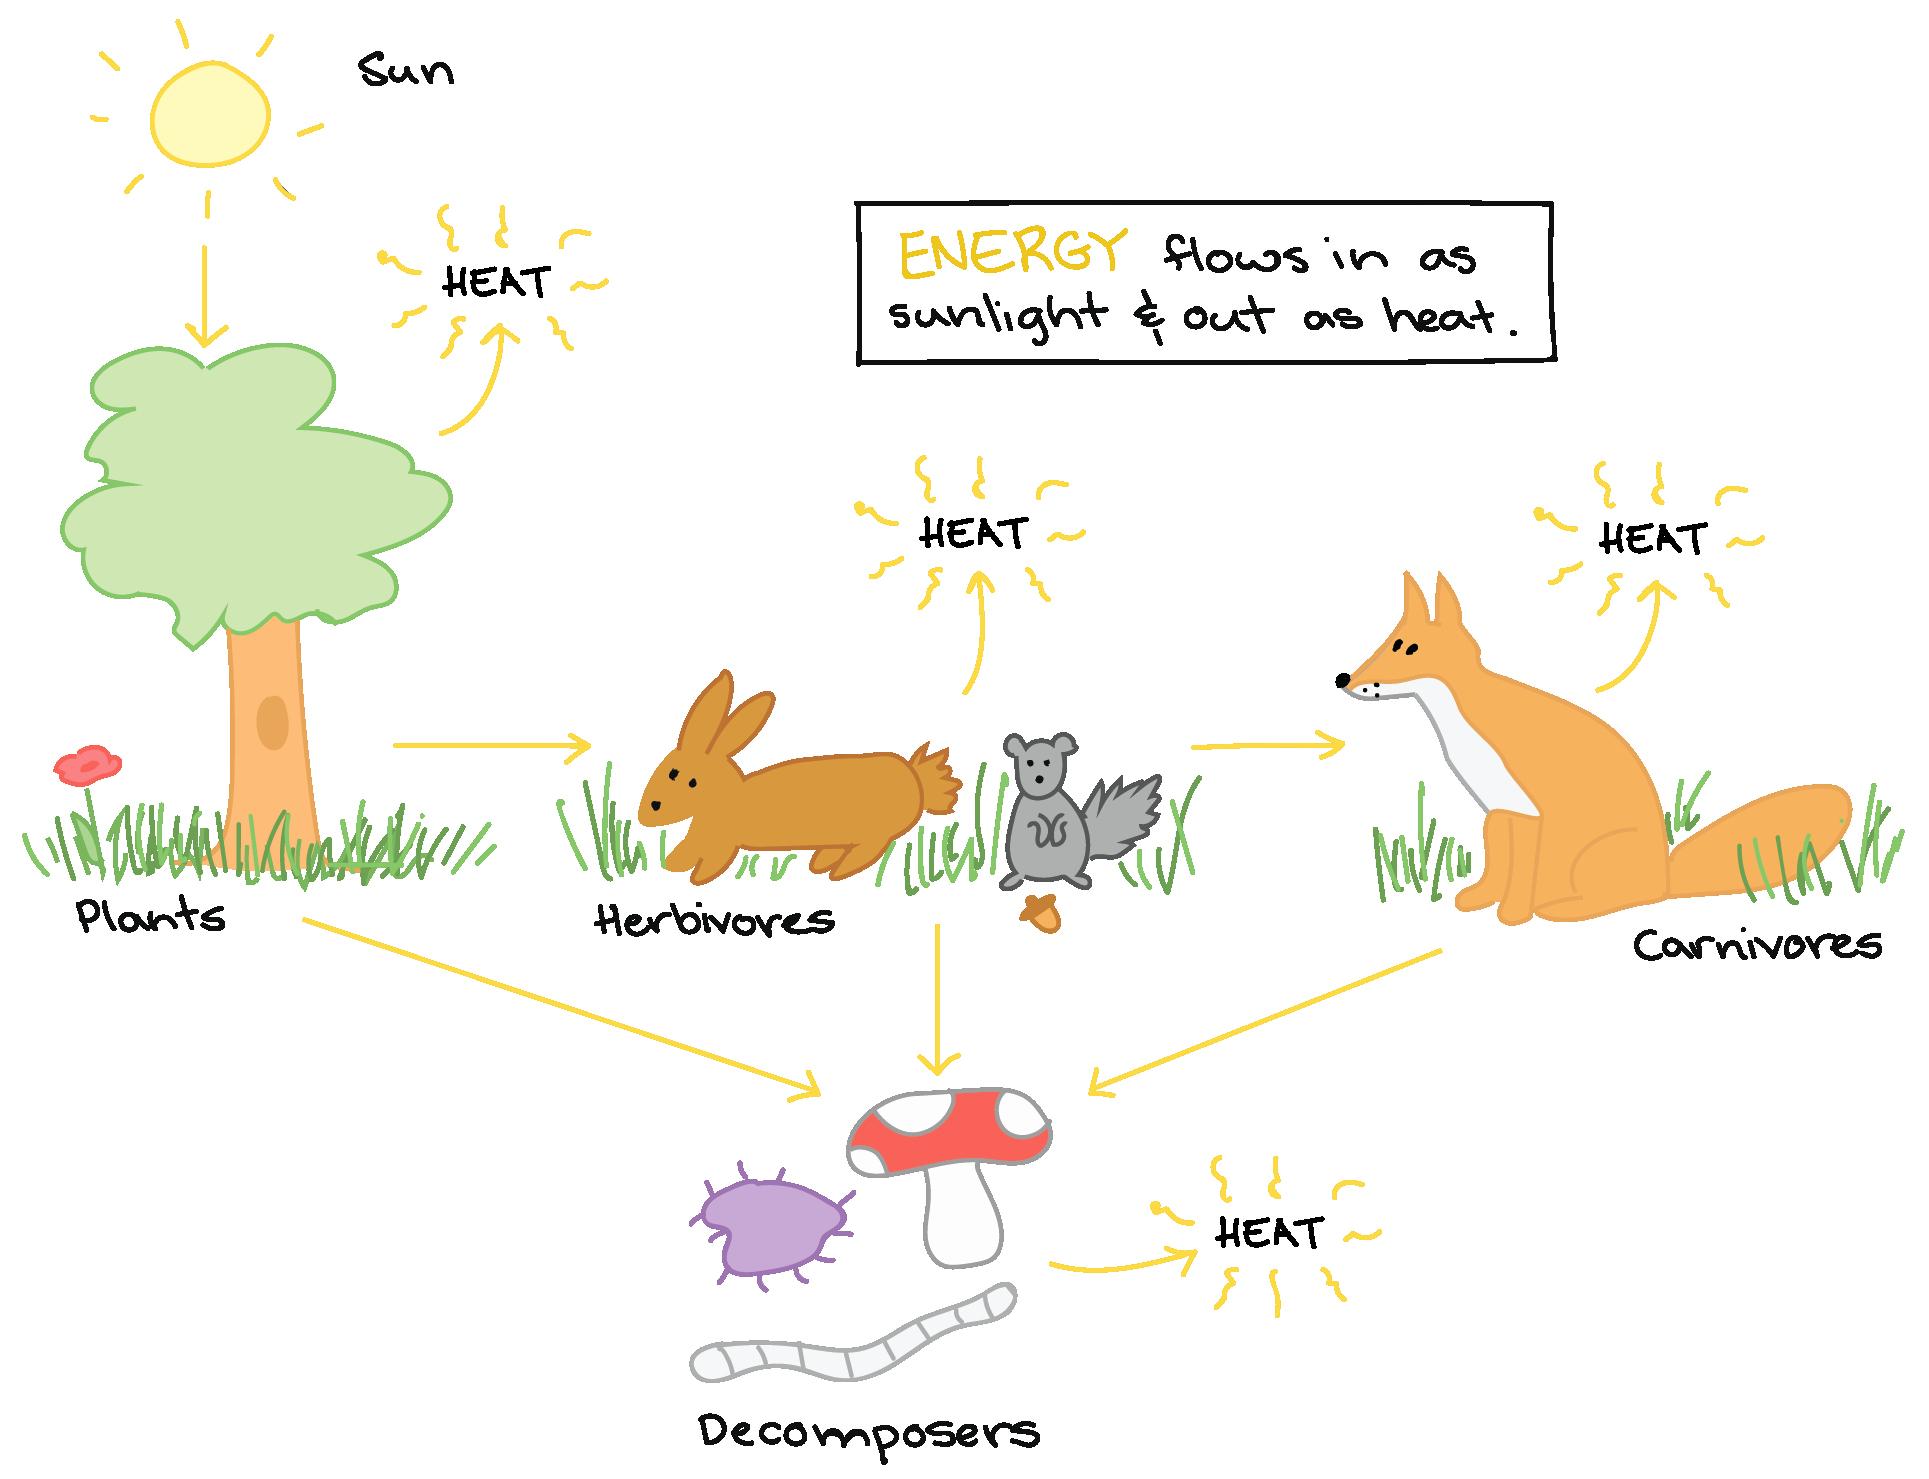 Energy Flow In Ecosystems Worksheet Beautiful Energy Flow In An Ecosystem Worksheet Answers Biozone